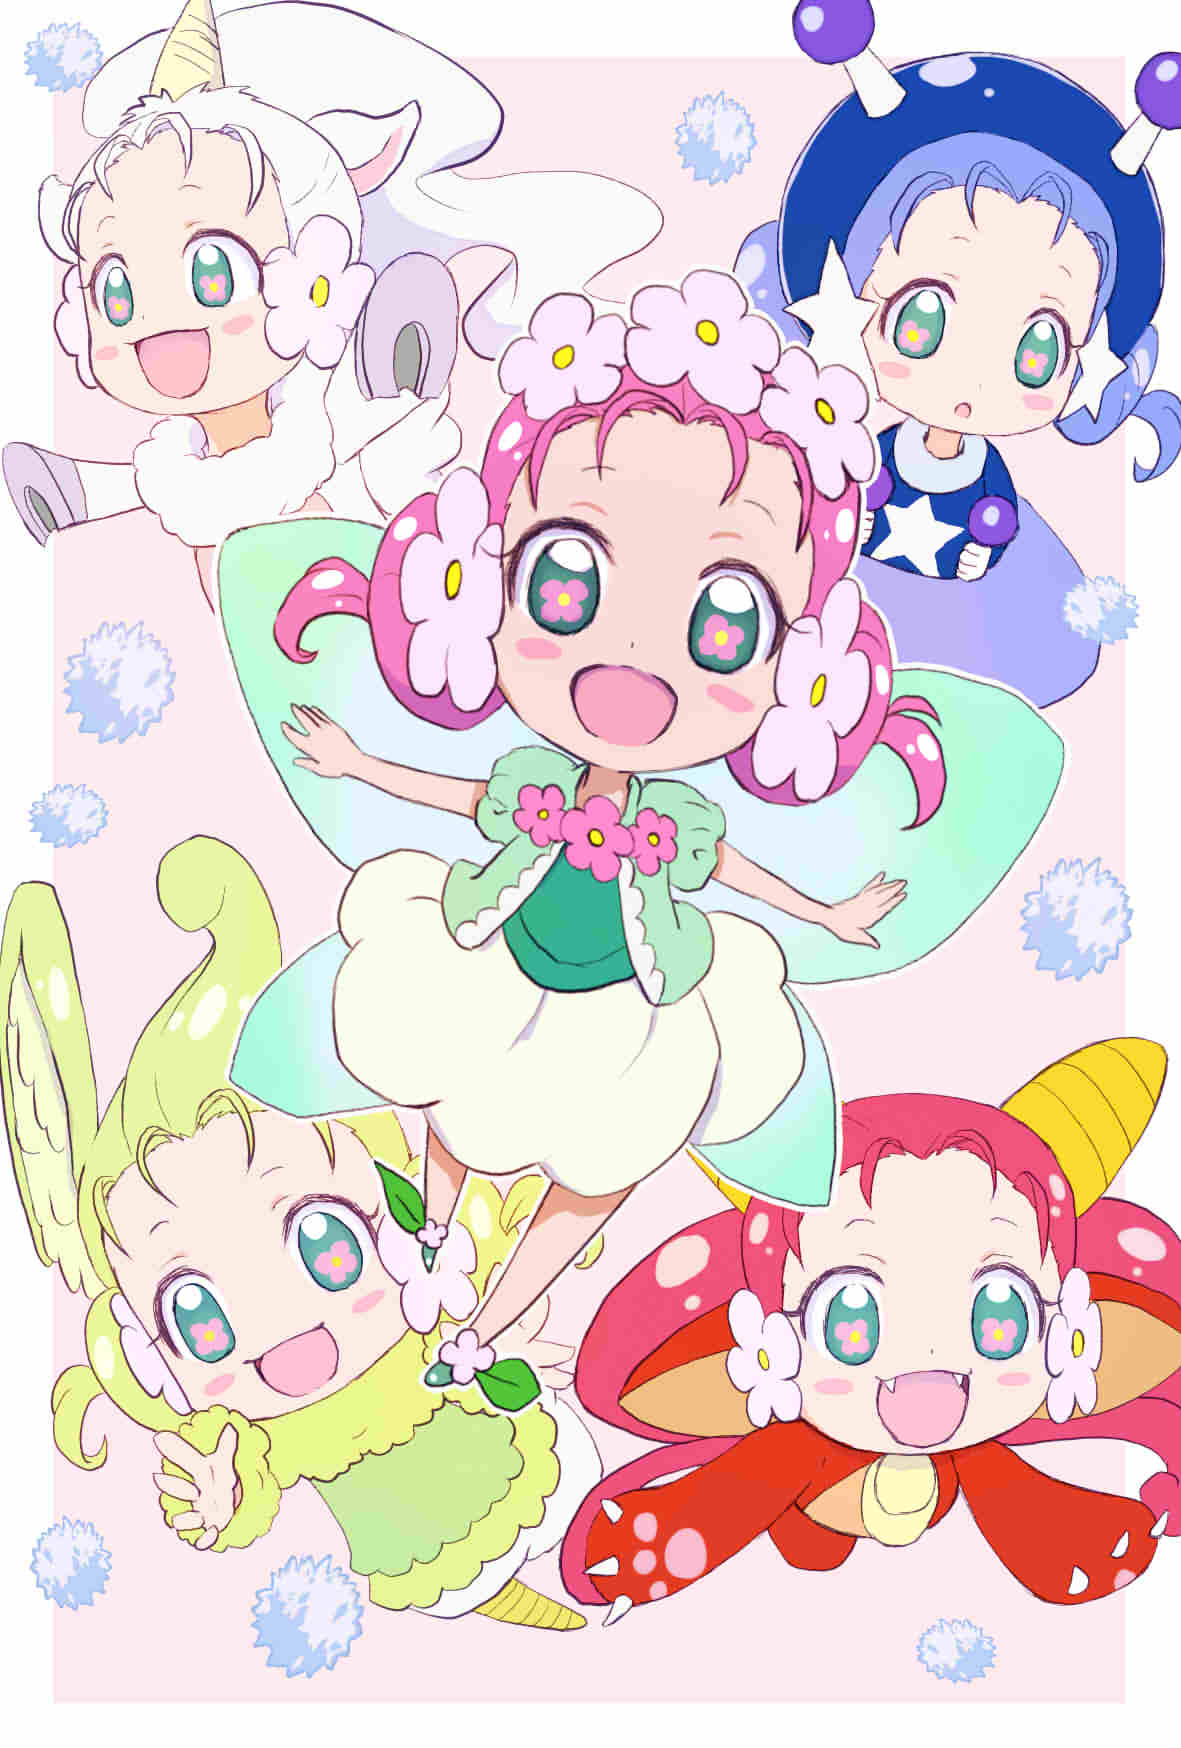 Haa-chan - Mahou Tsukai Precure! - Image #2576425 - Zerochan Anime